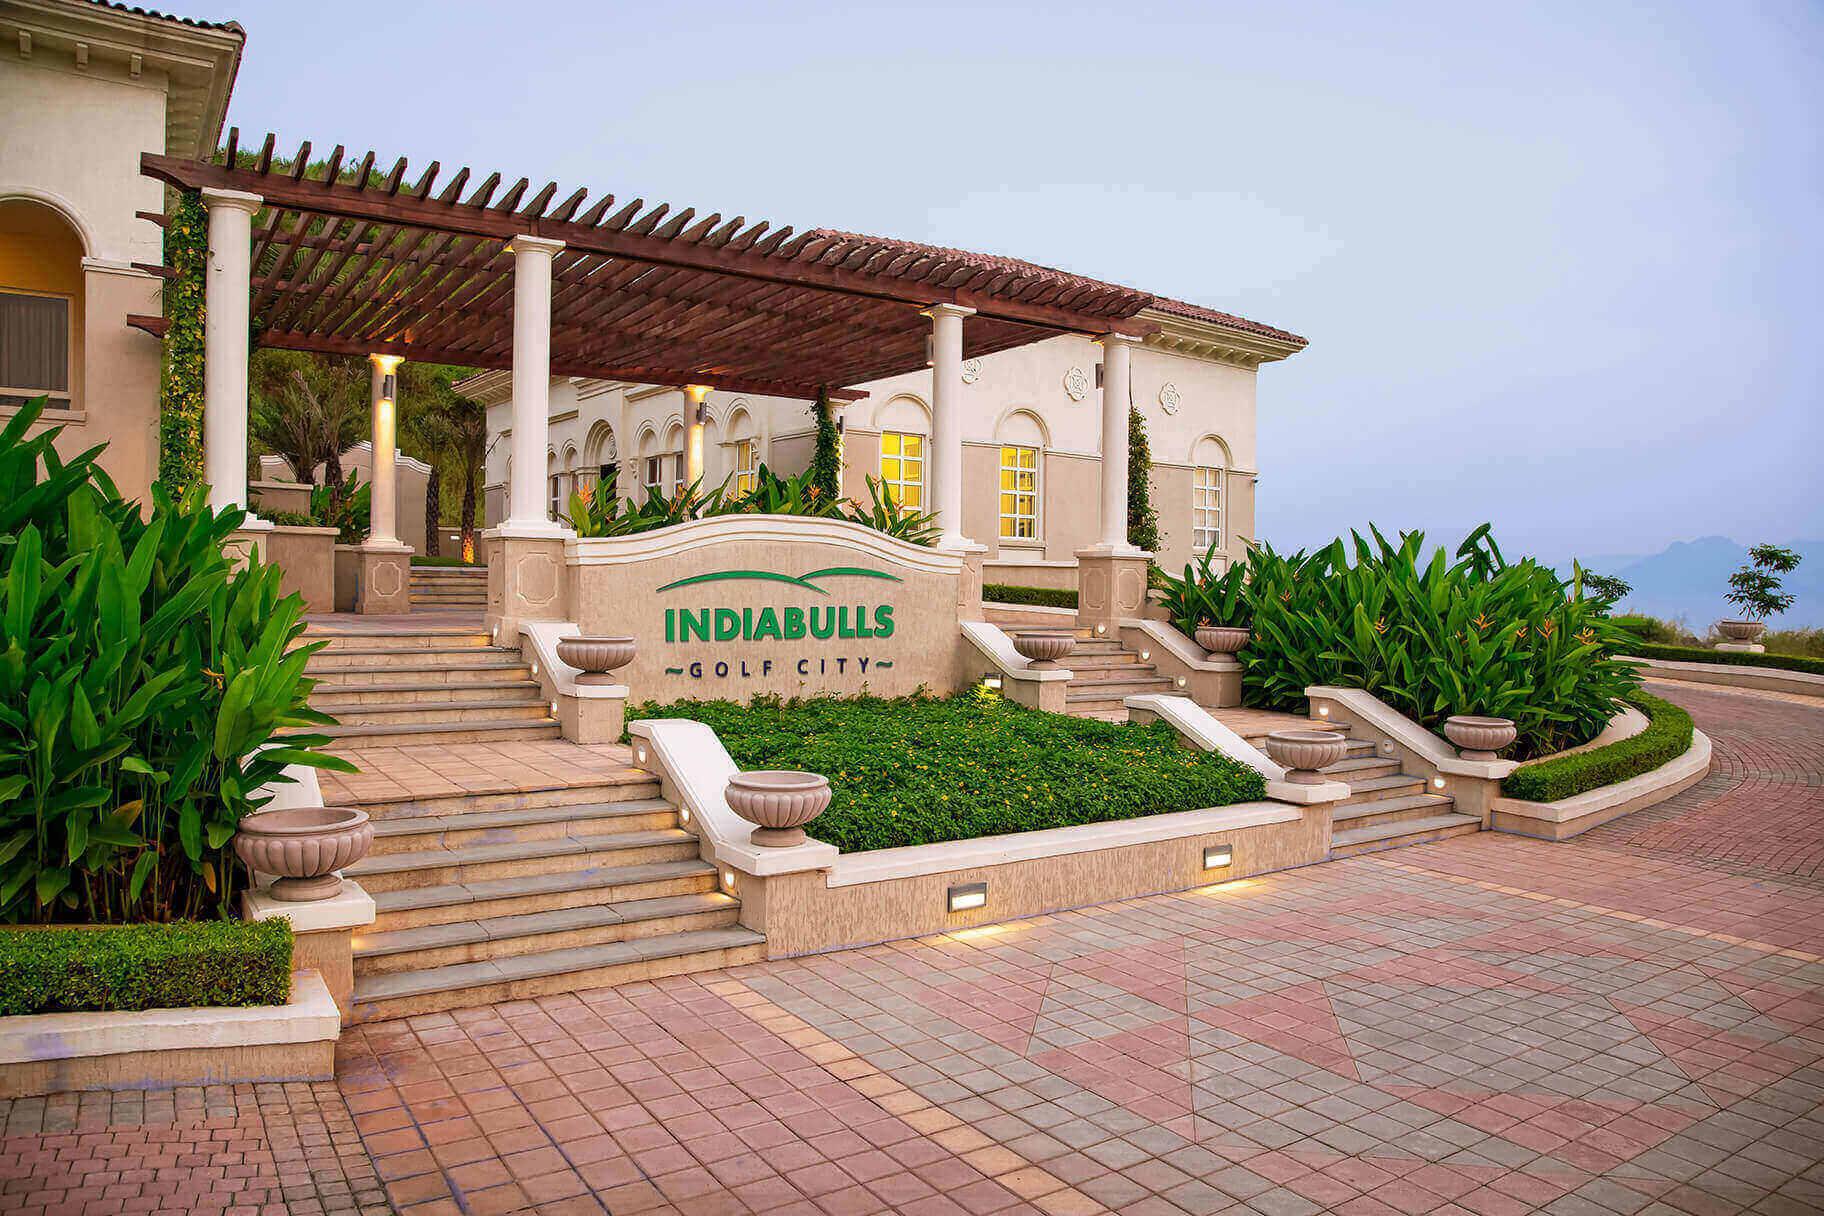 Property in Savroli - Indiabulls Golf City